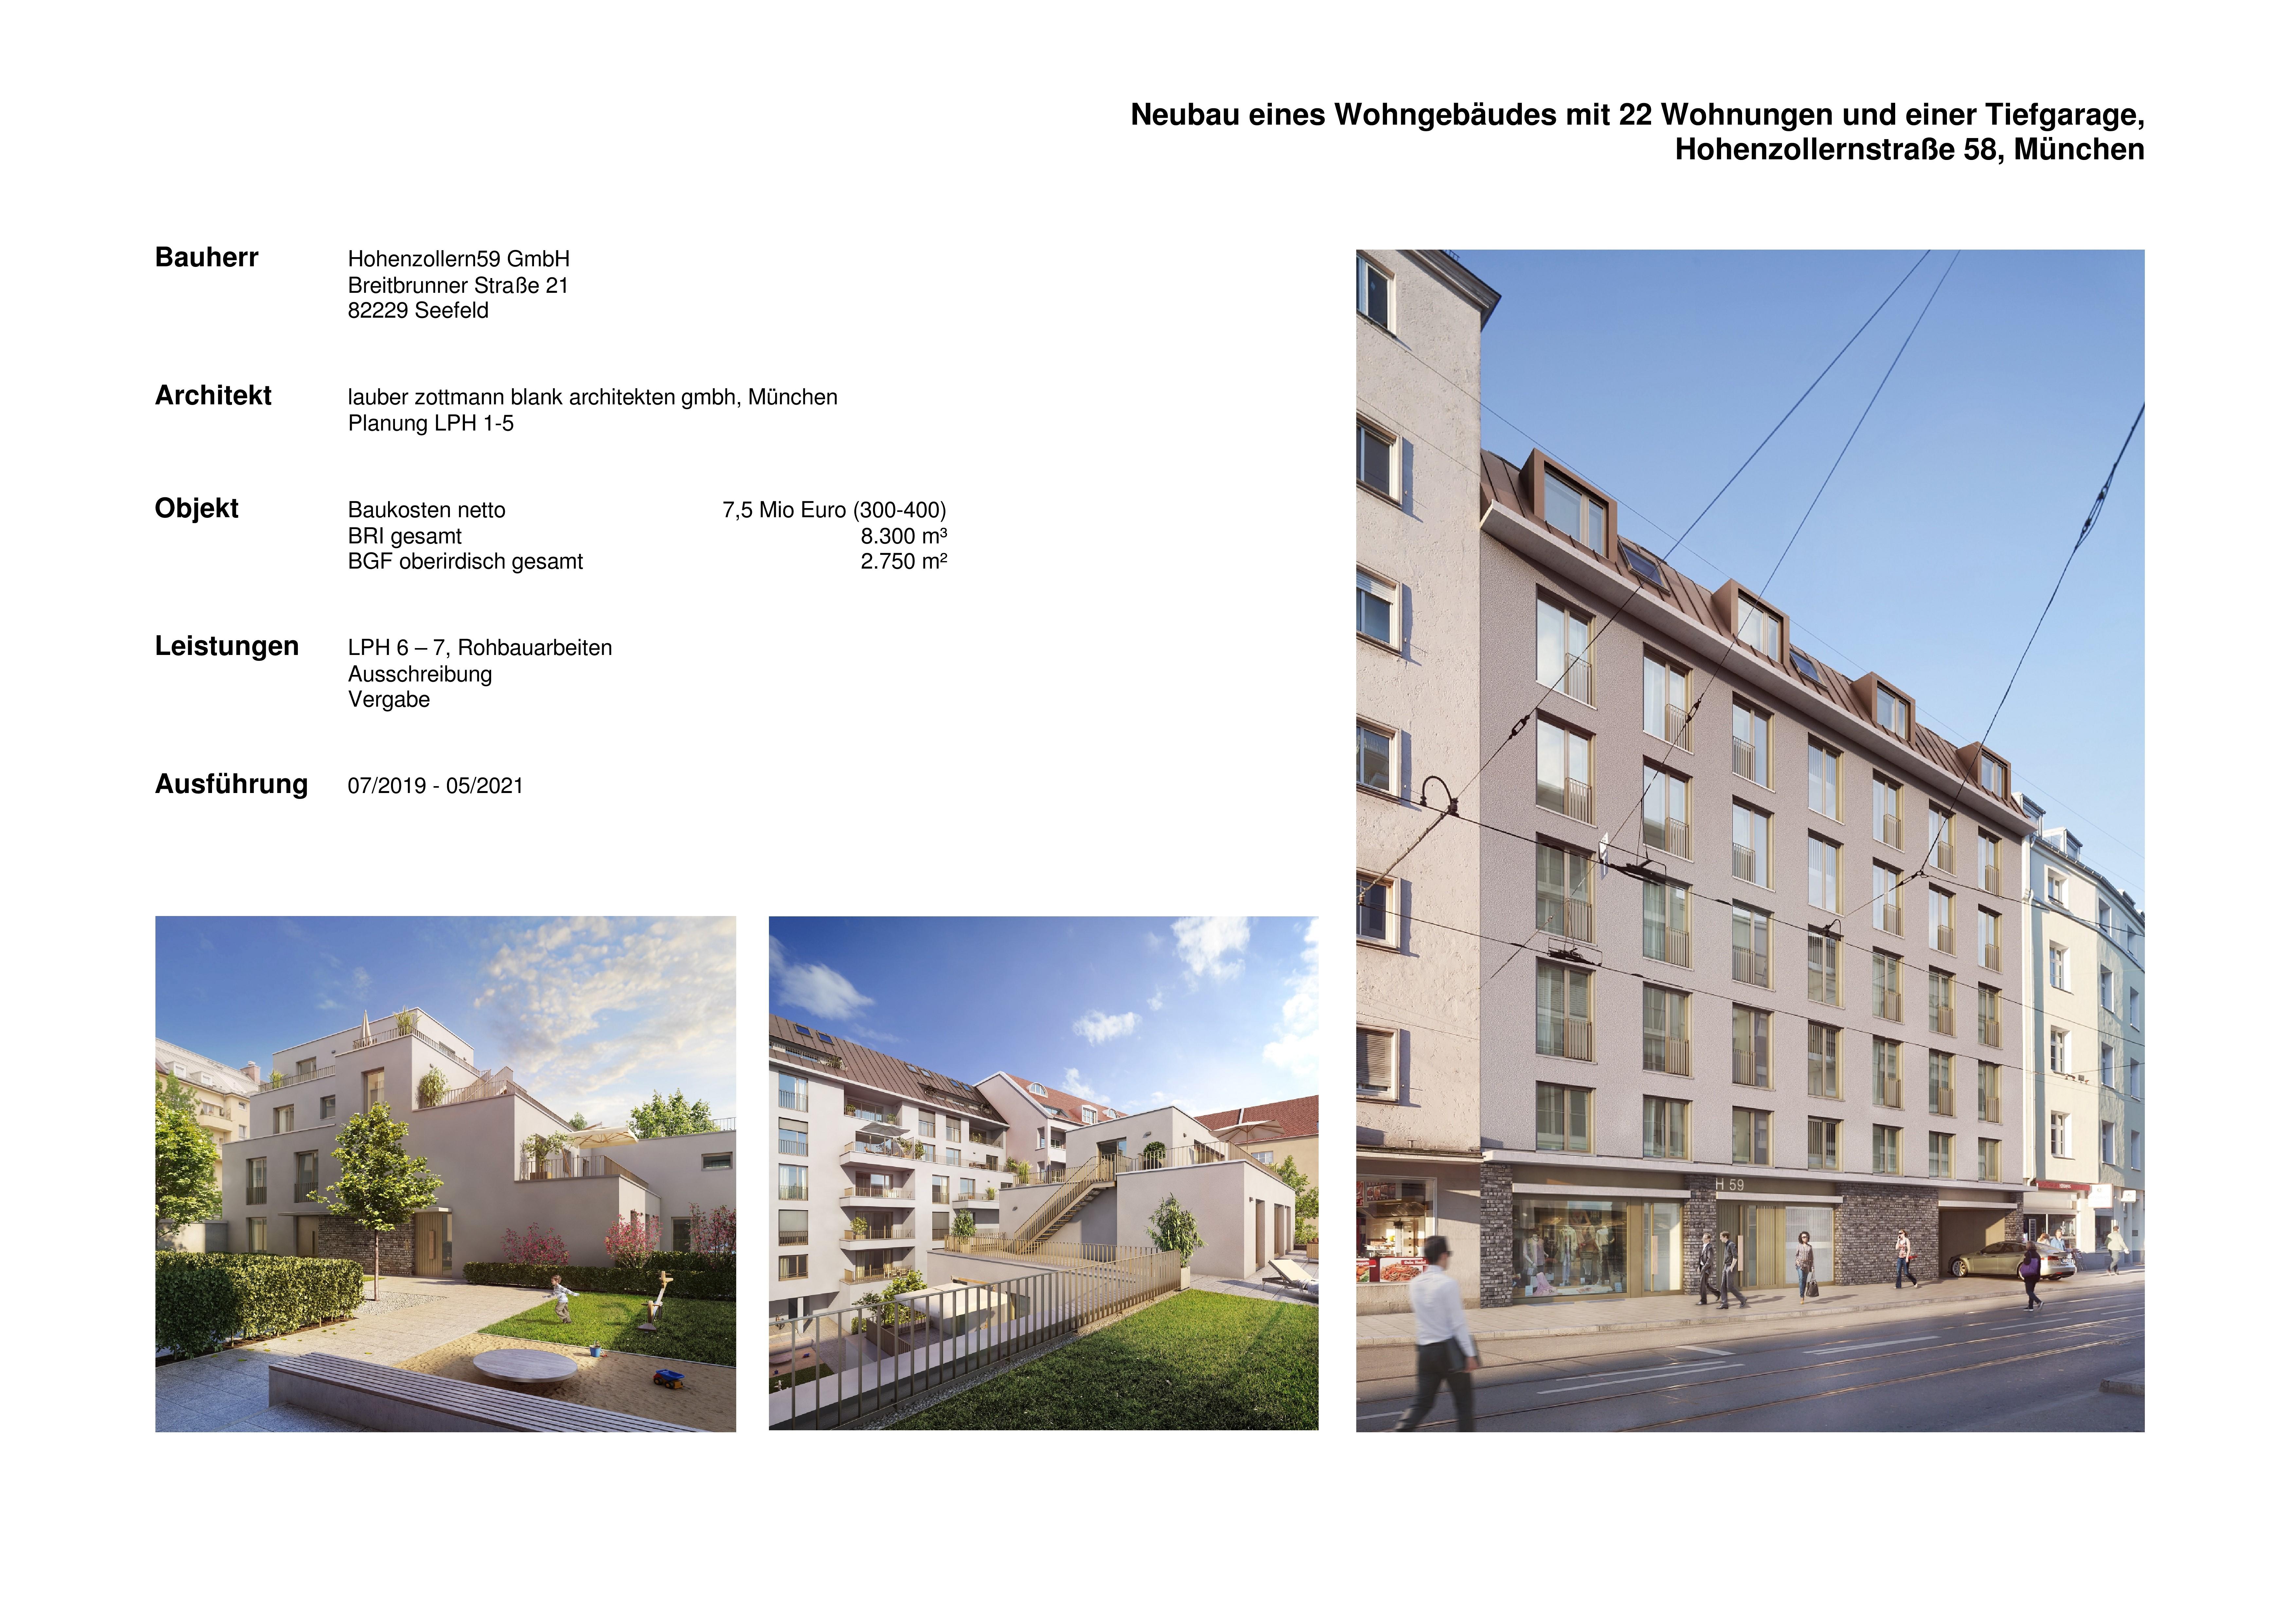 Hohenzollernstr